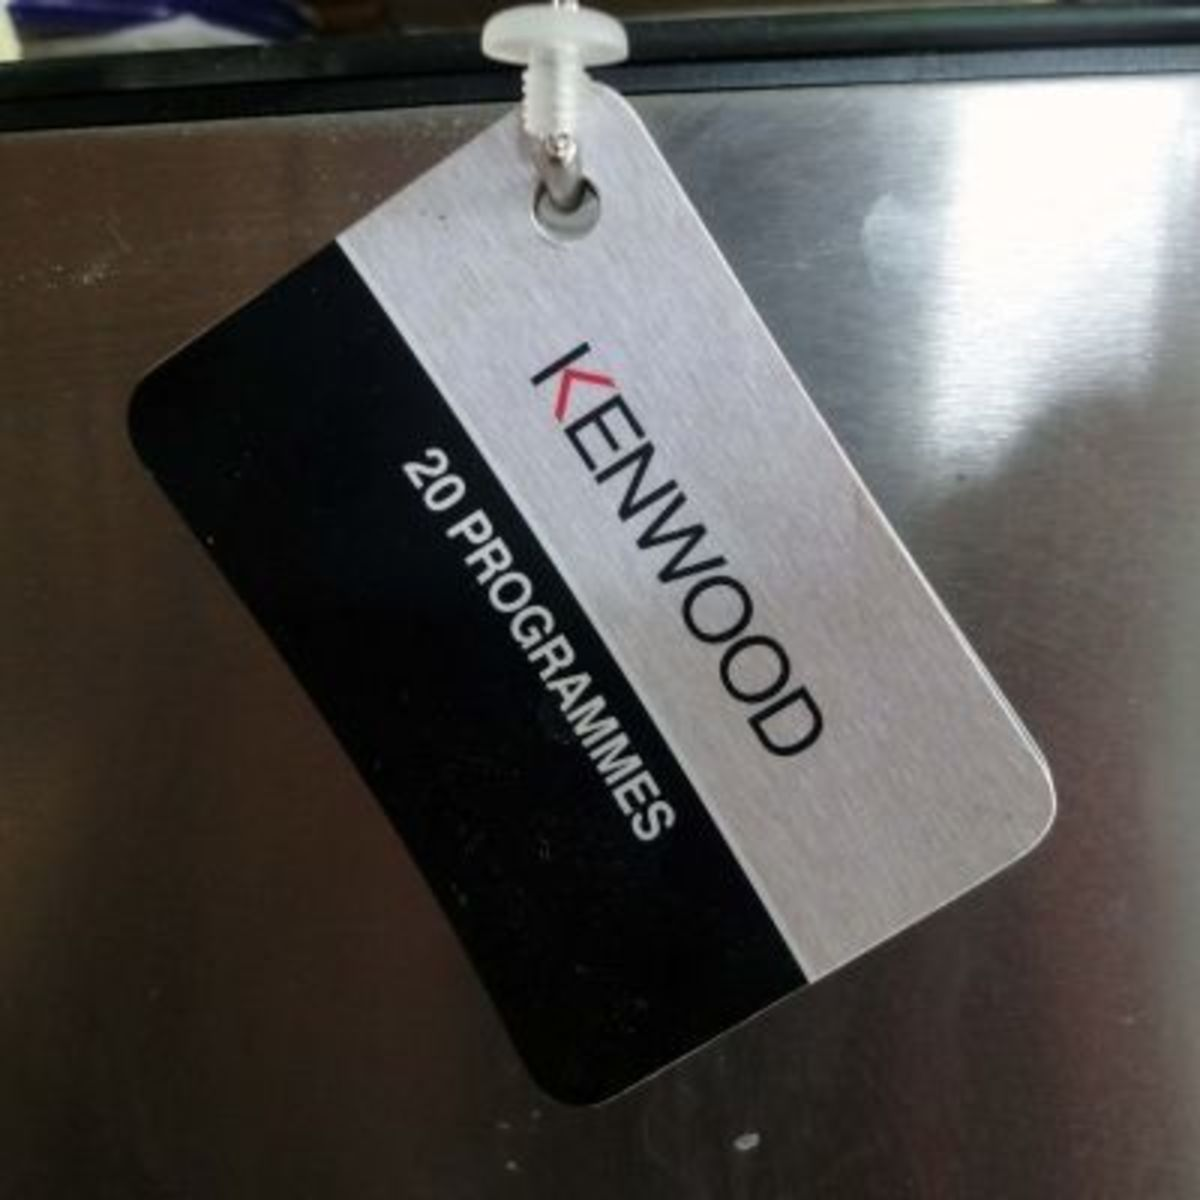 20 Programmes of Kenwood Bread Maker